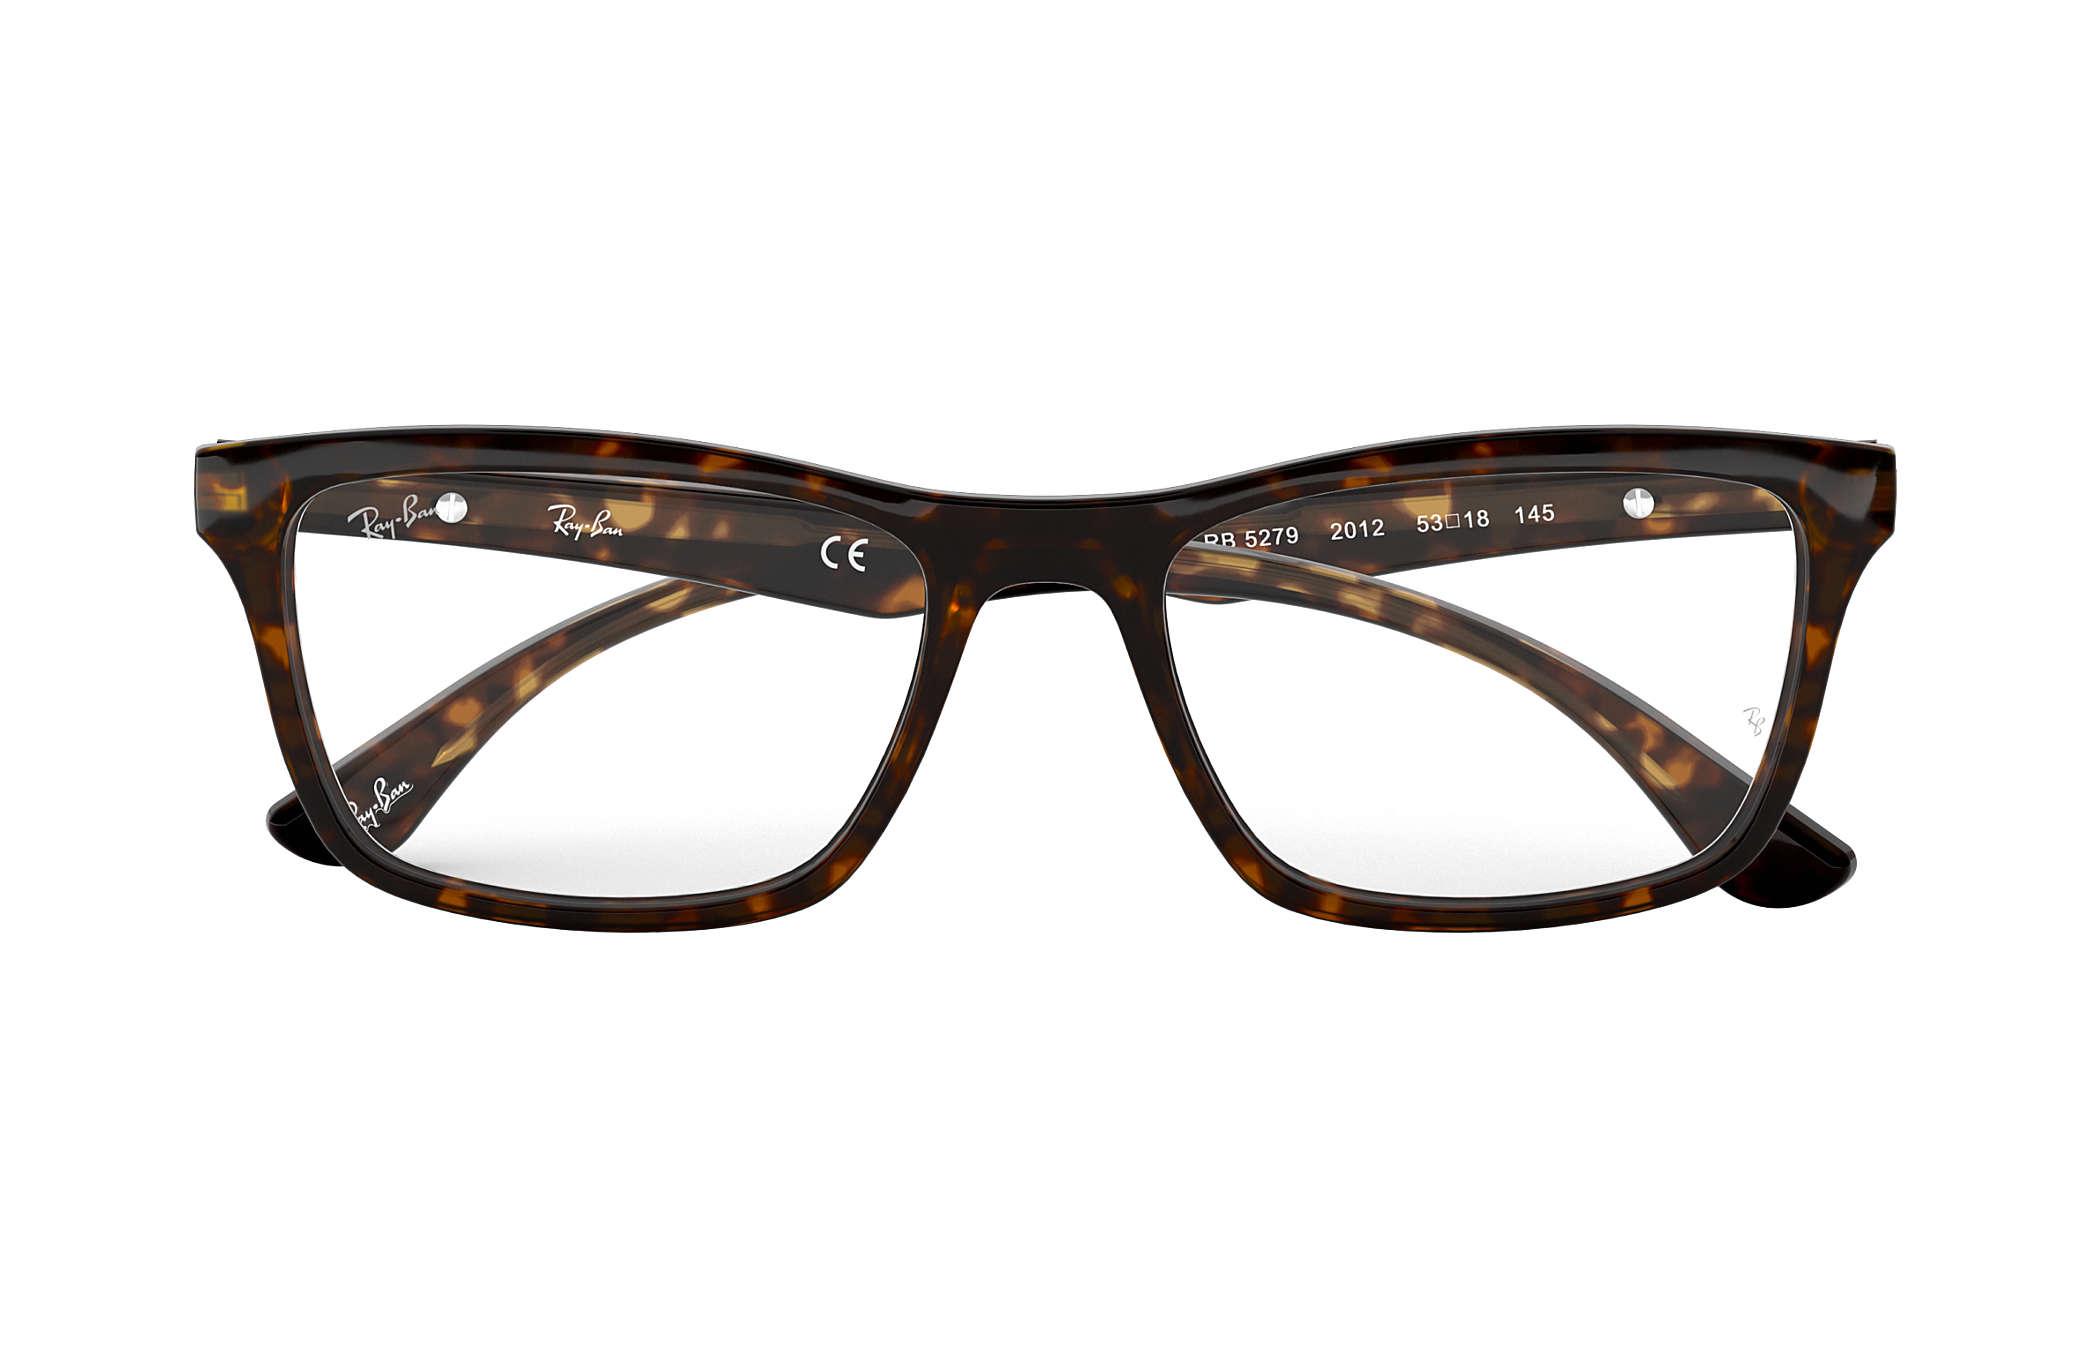 99ec7015d788d Ray-Ban prescription glasses RB5279 Tortoise - Acetate ...